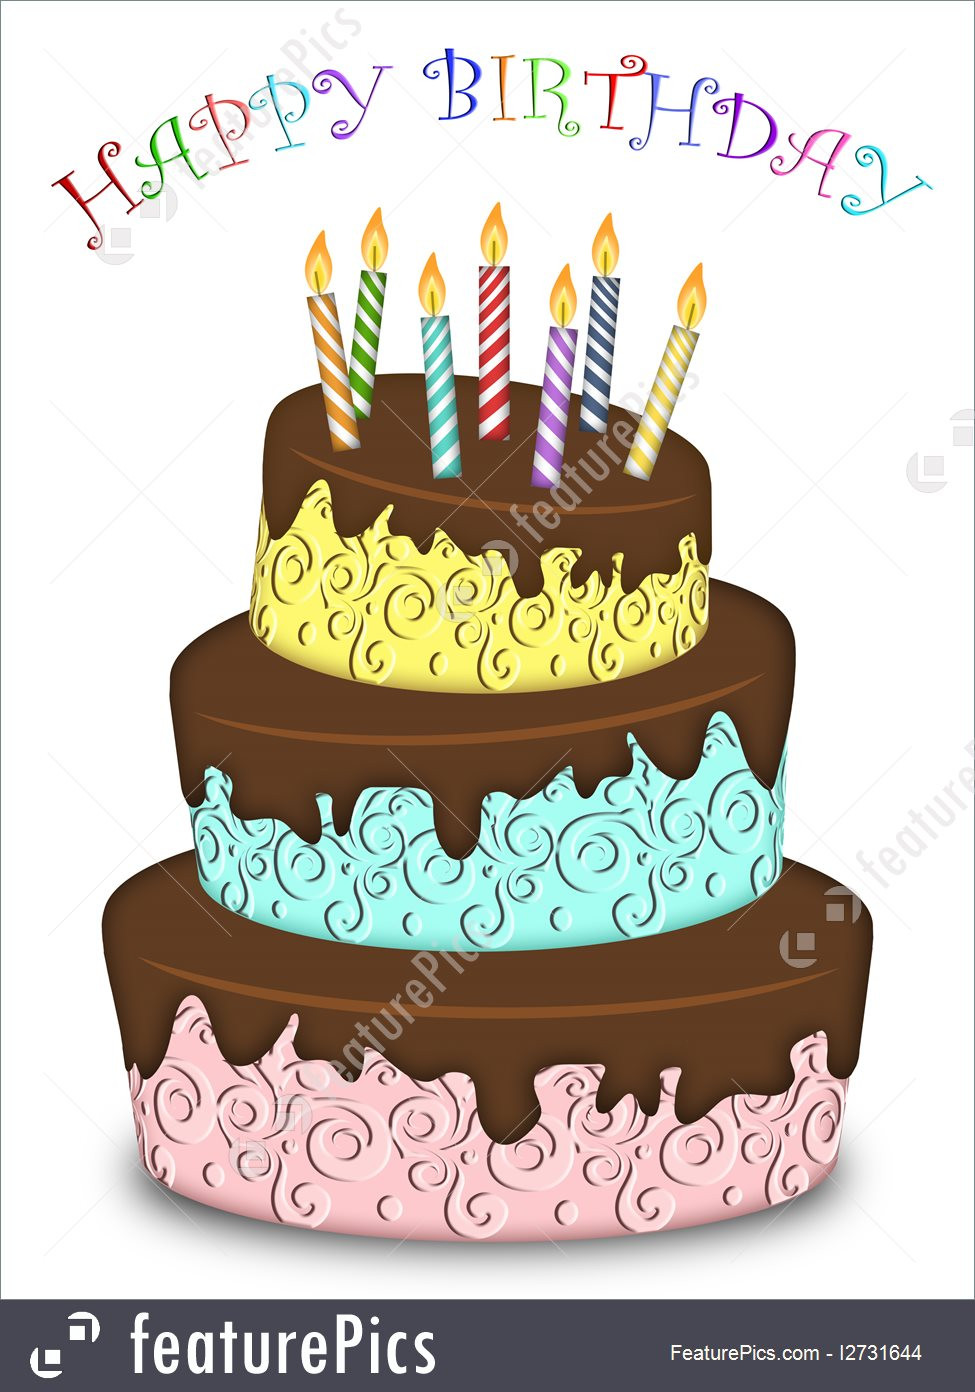 Image Birthday Cake  Celebration Happy Birthday Three Layer Funny Cake With